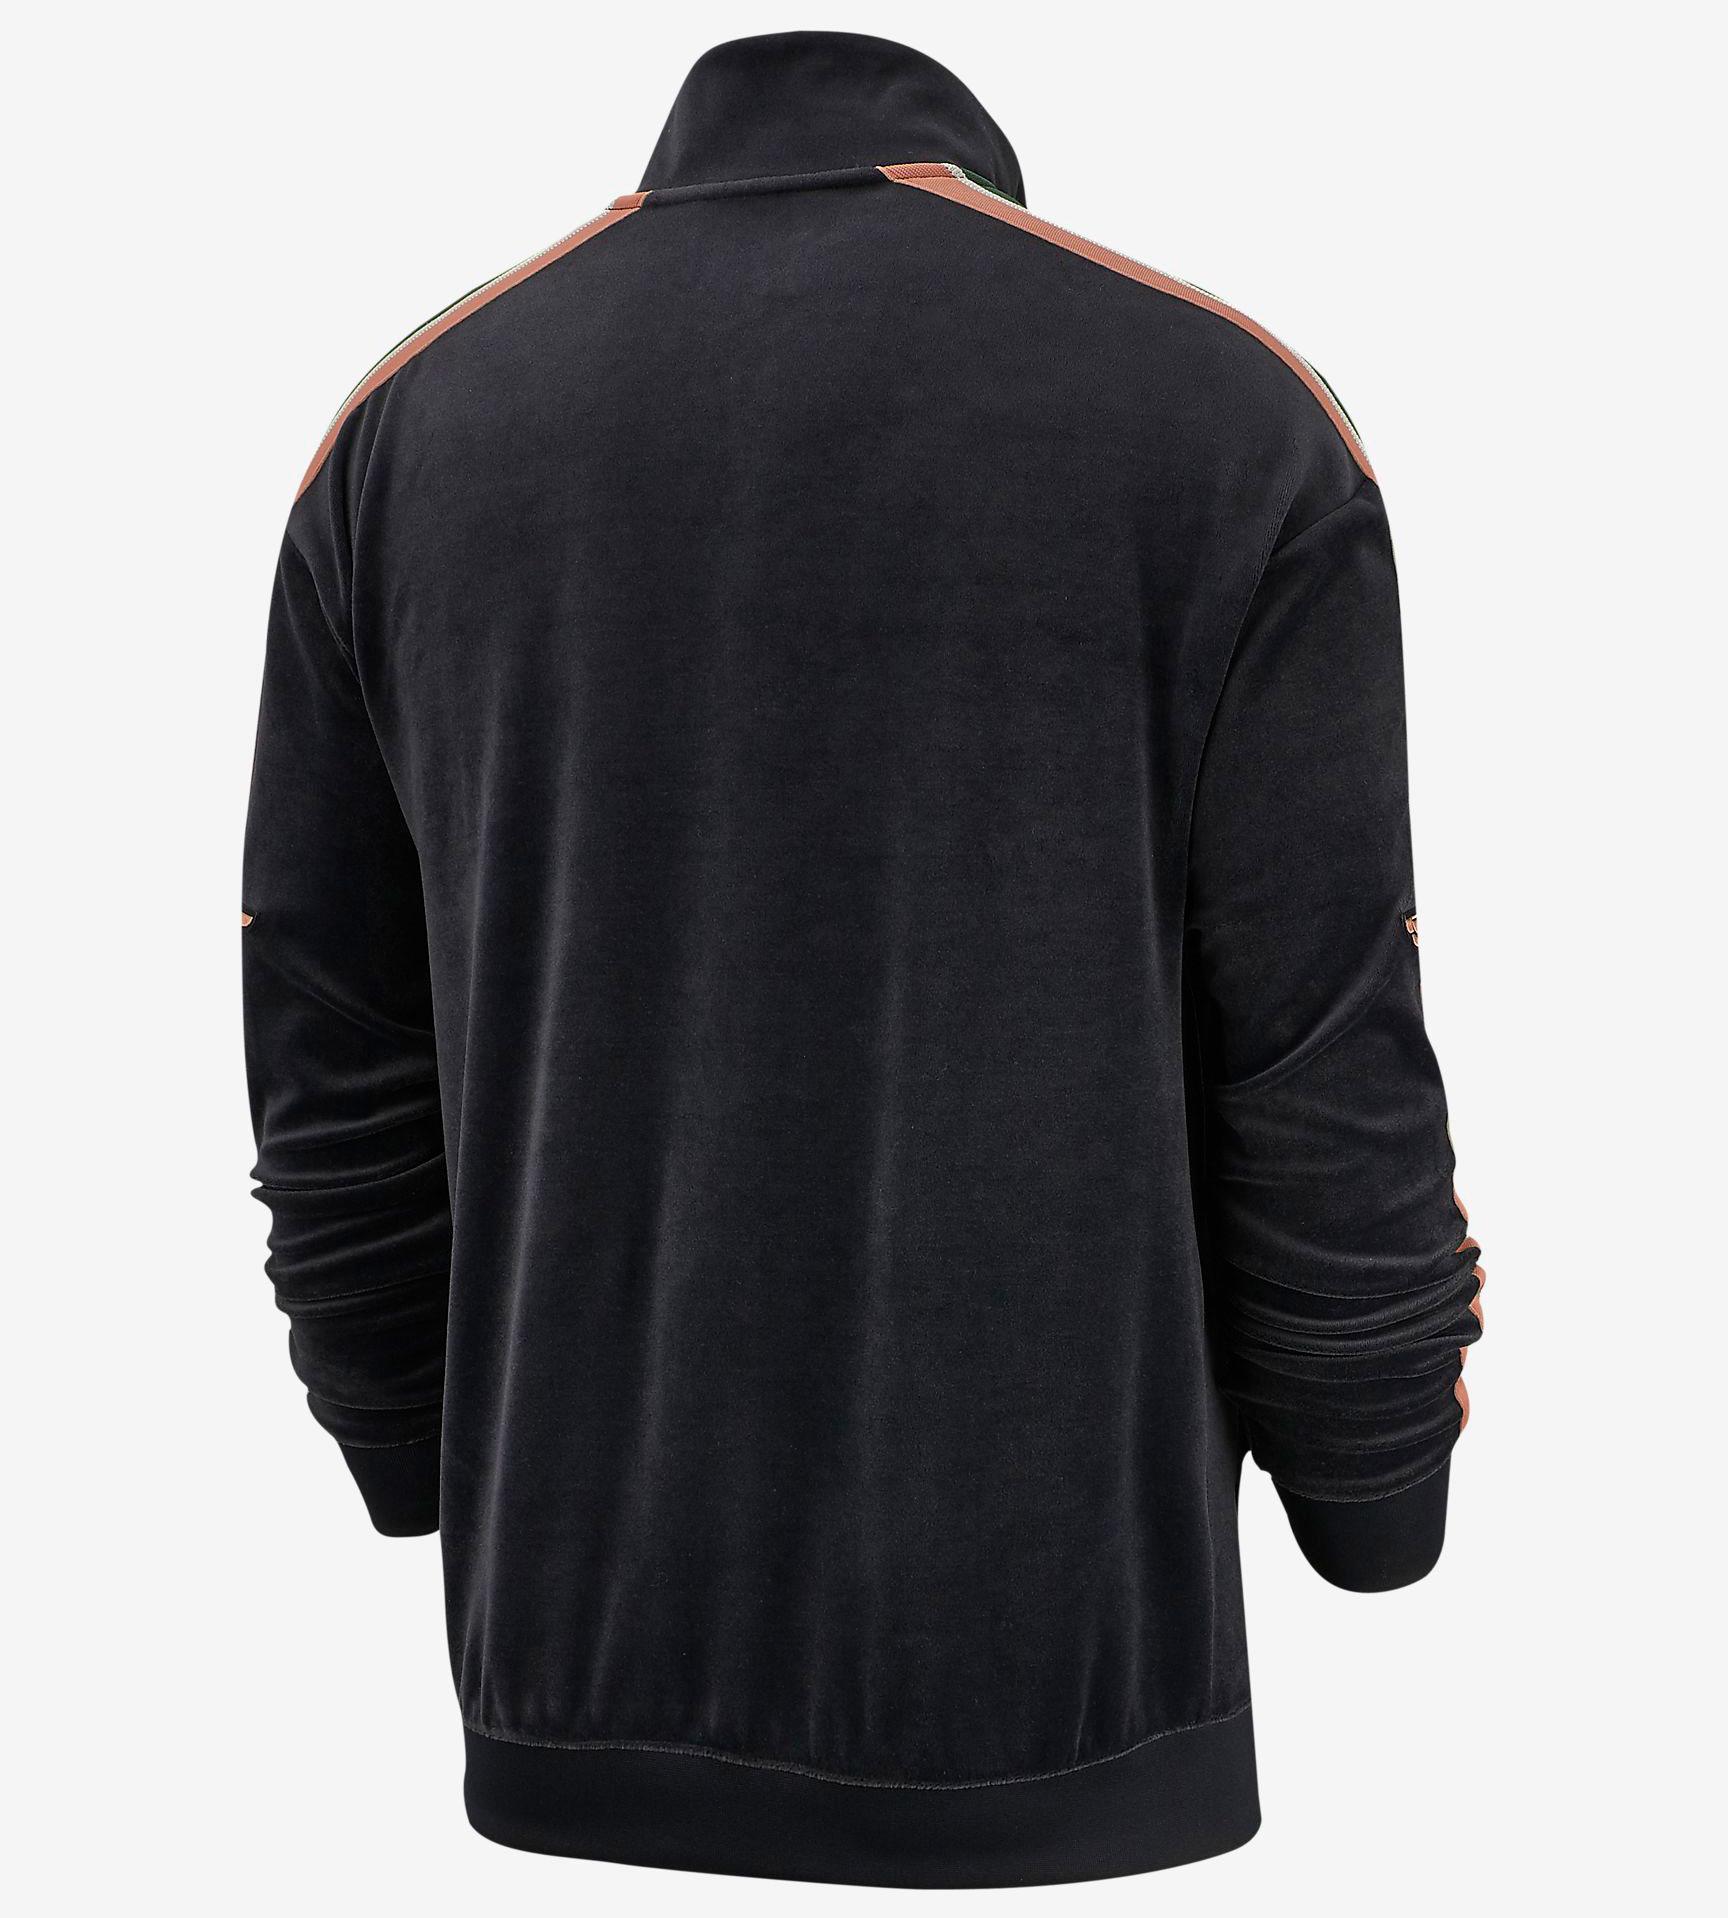 jordan-1-crimson-tint-matching-jacket-2